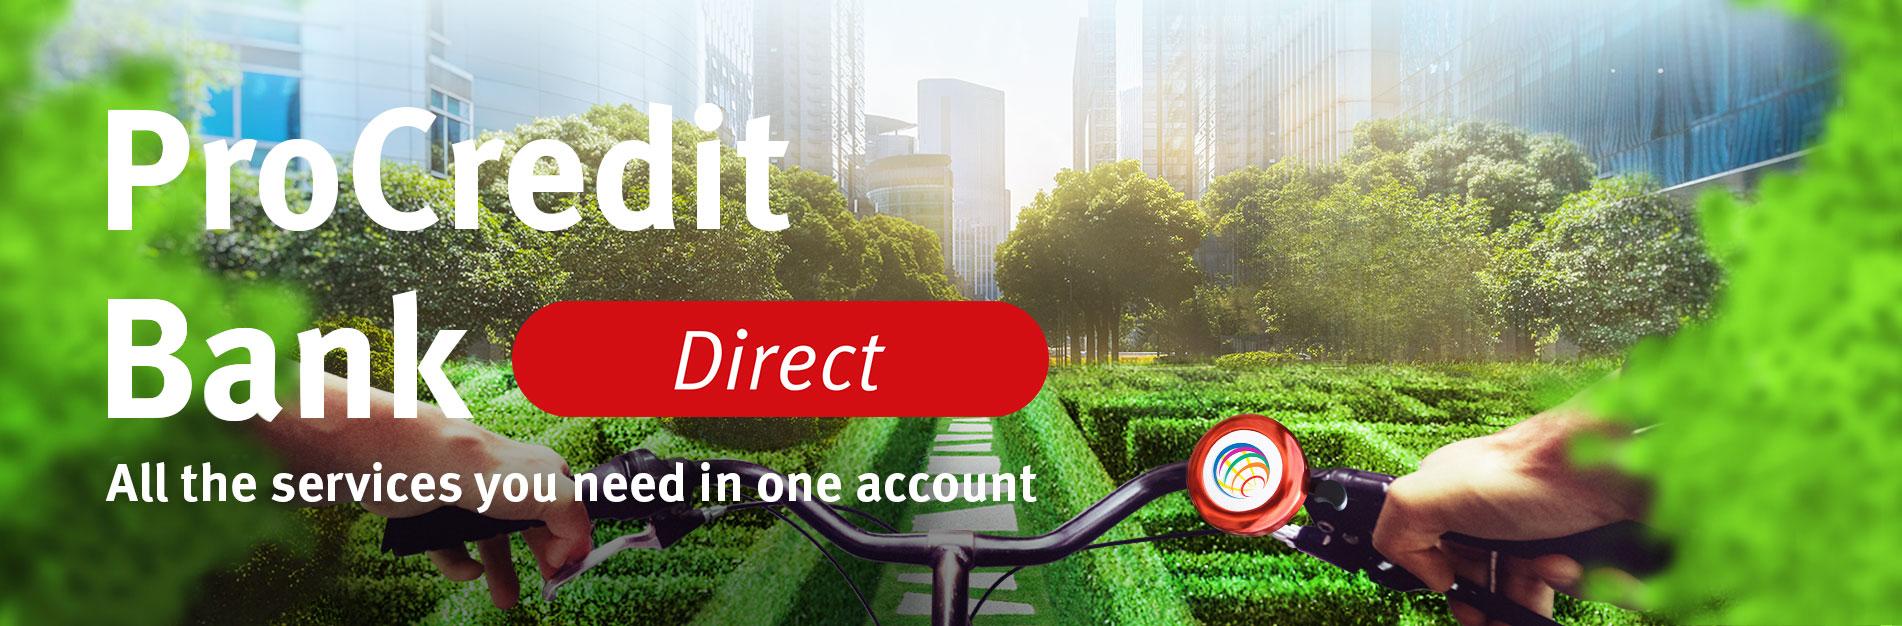 Procredit Bank Direct